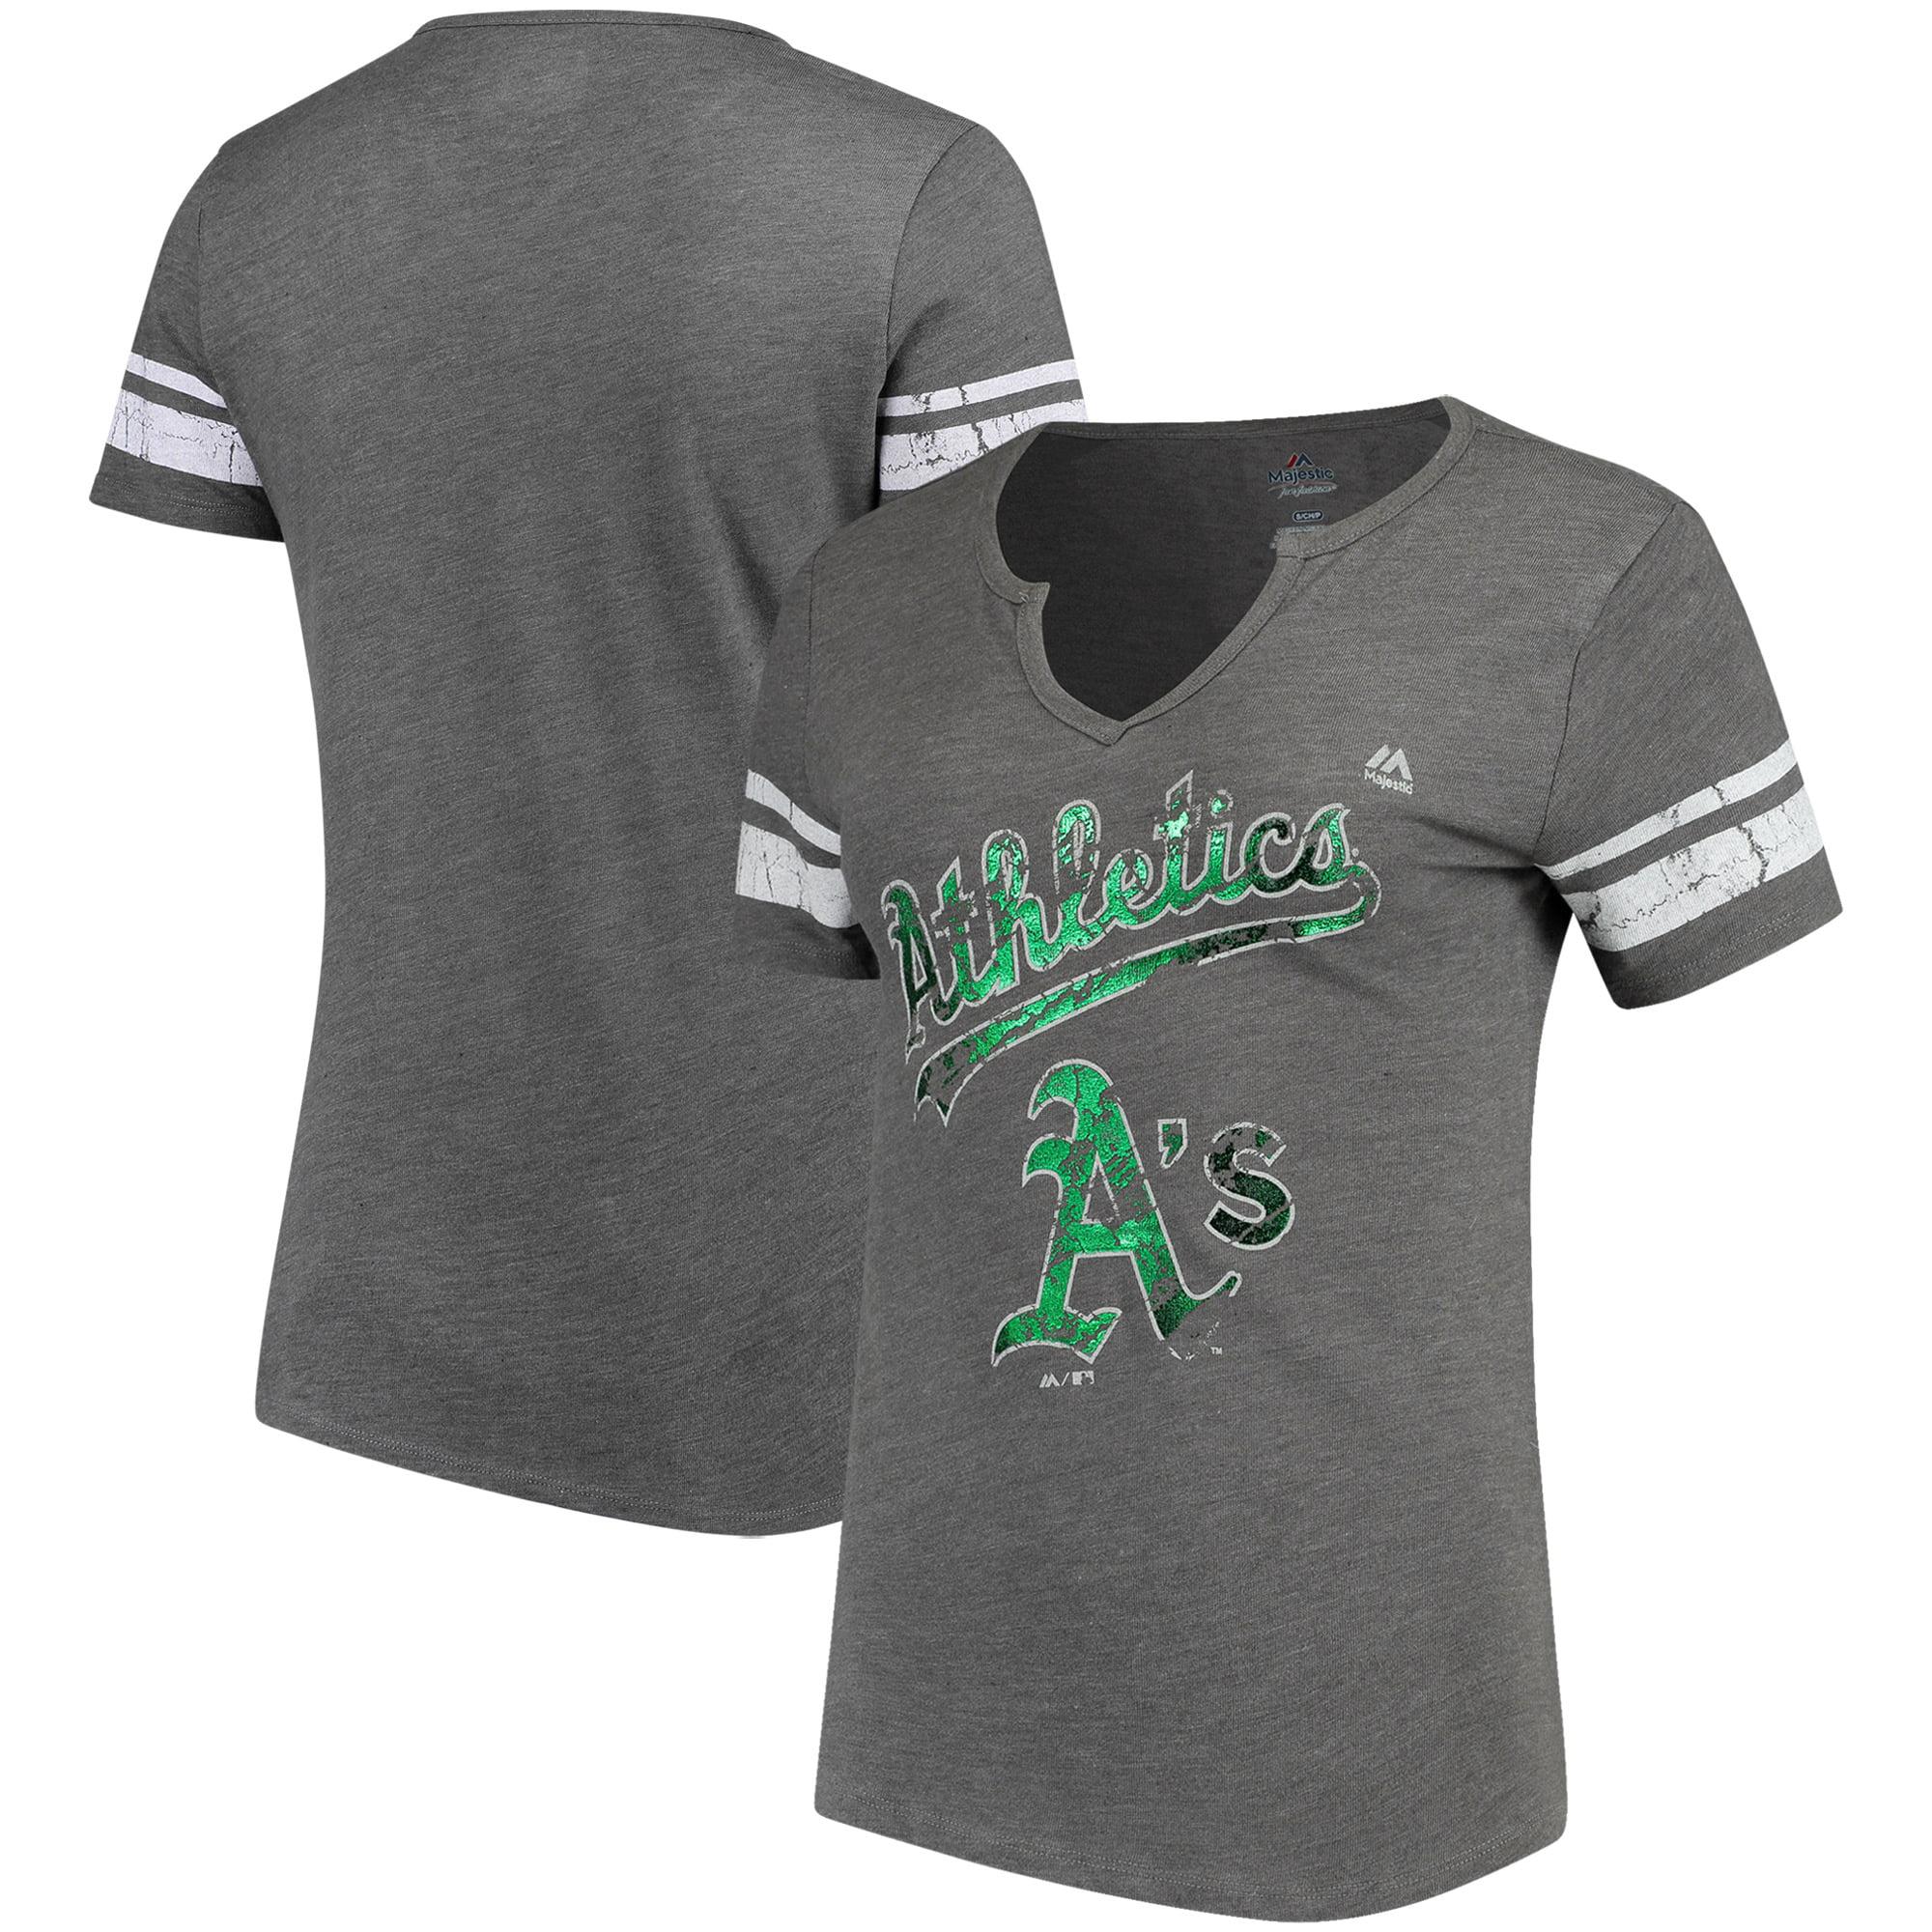 Oakland Athletics Majestic Women's Two Seamer V-Notch Tri-Blend T-Shirt - Gray/White